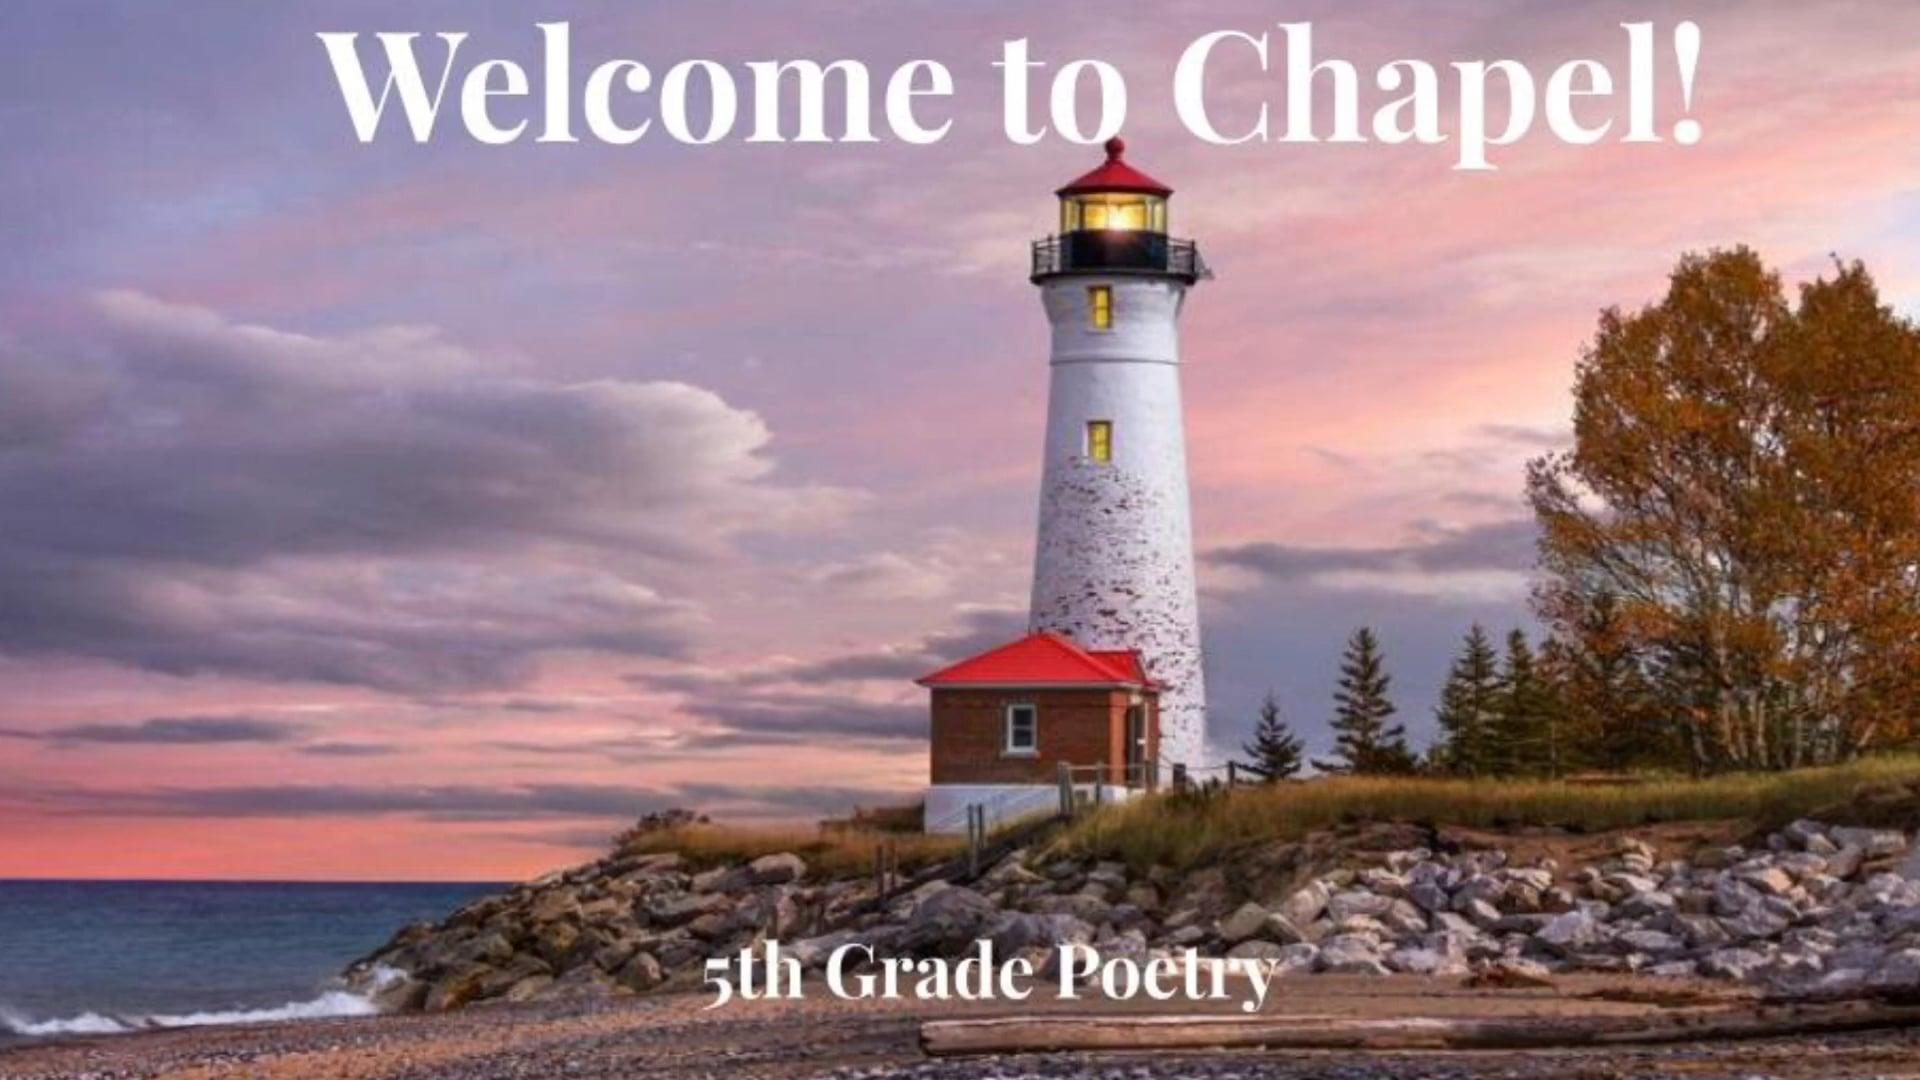 2021_02_02 Chapel 5th Grade Poetry